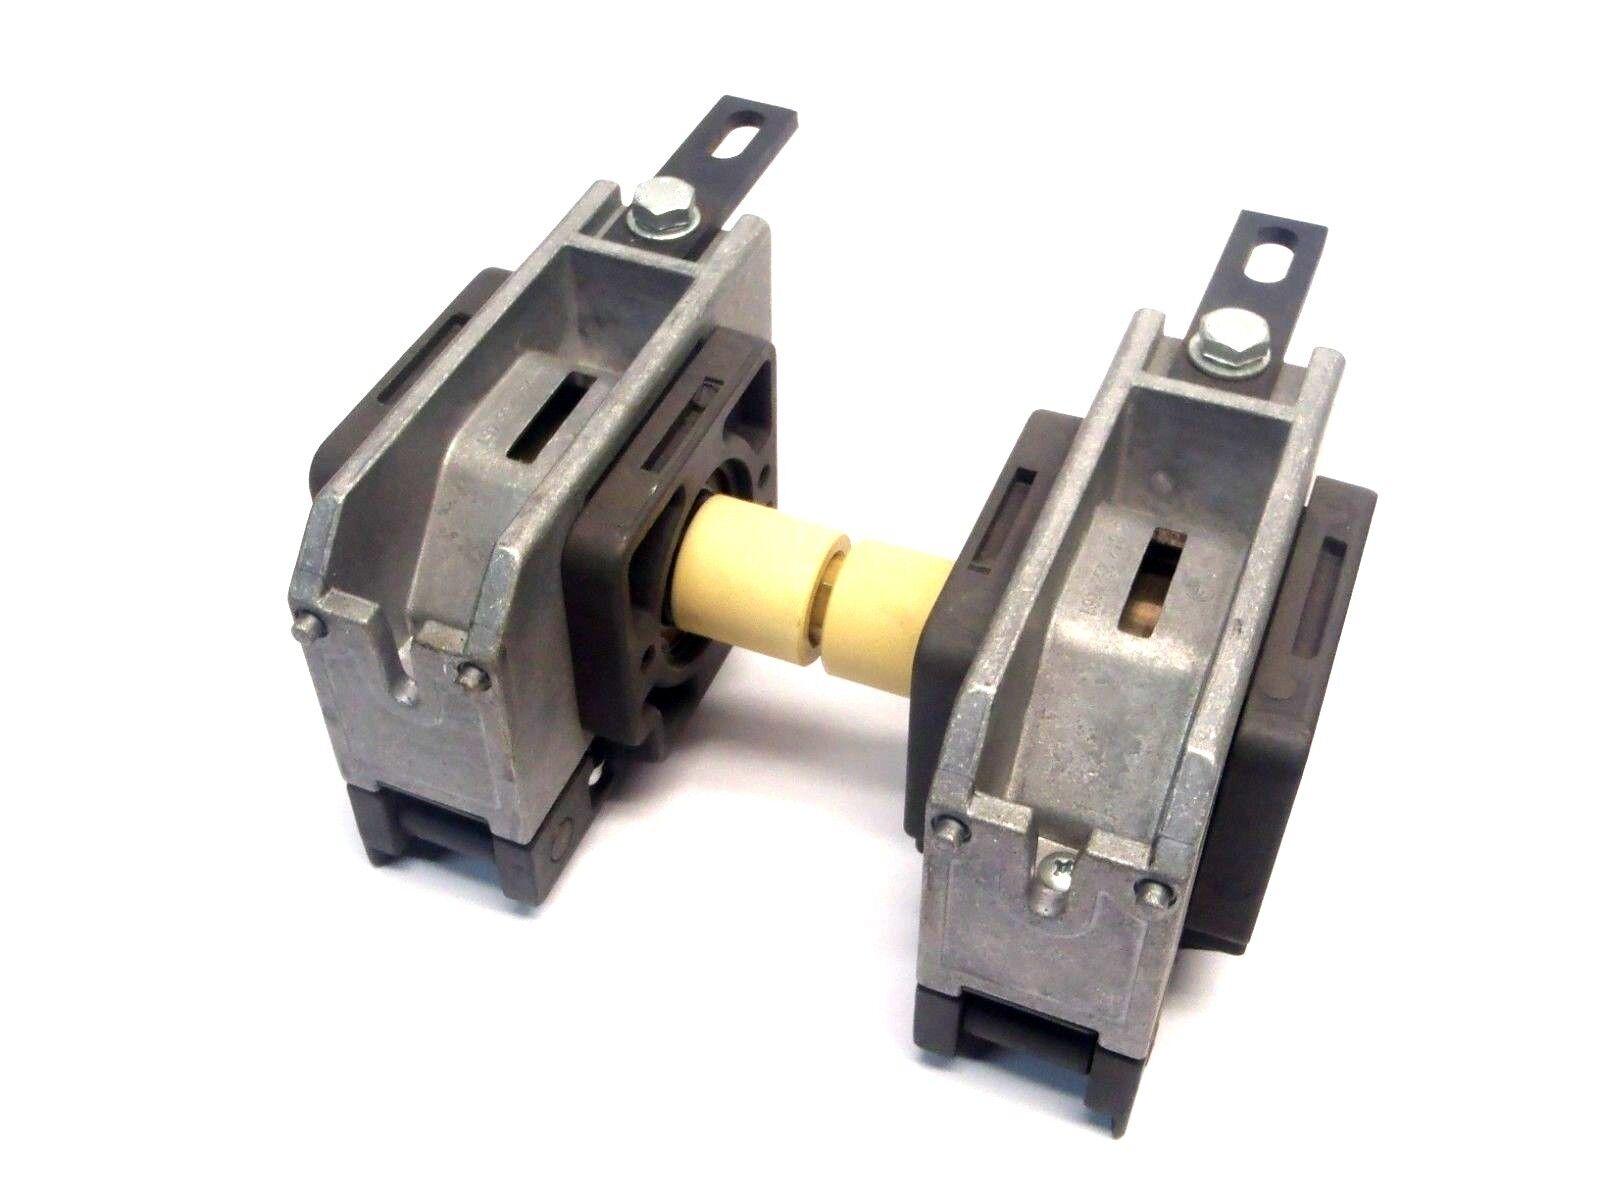 Lot of (2) Bosch Rexredh 3842235461 Convyor Drive Botton Assembly